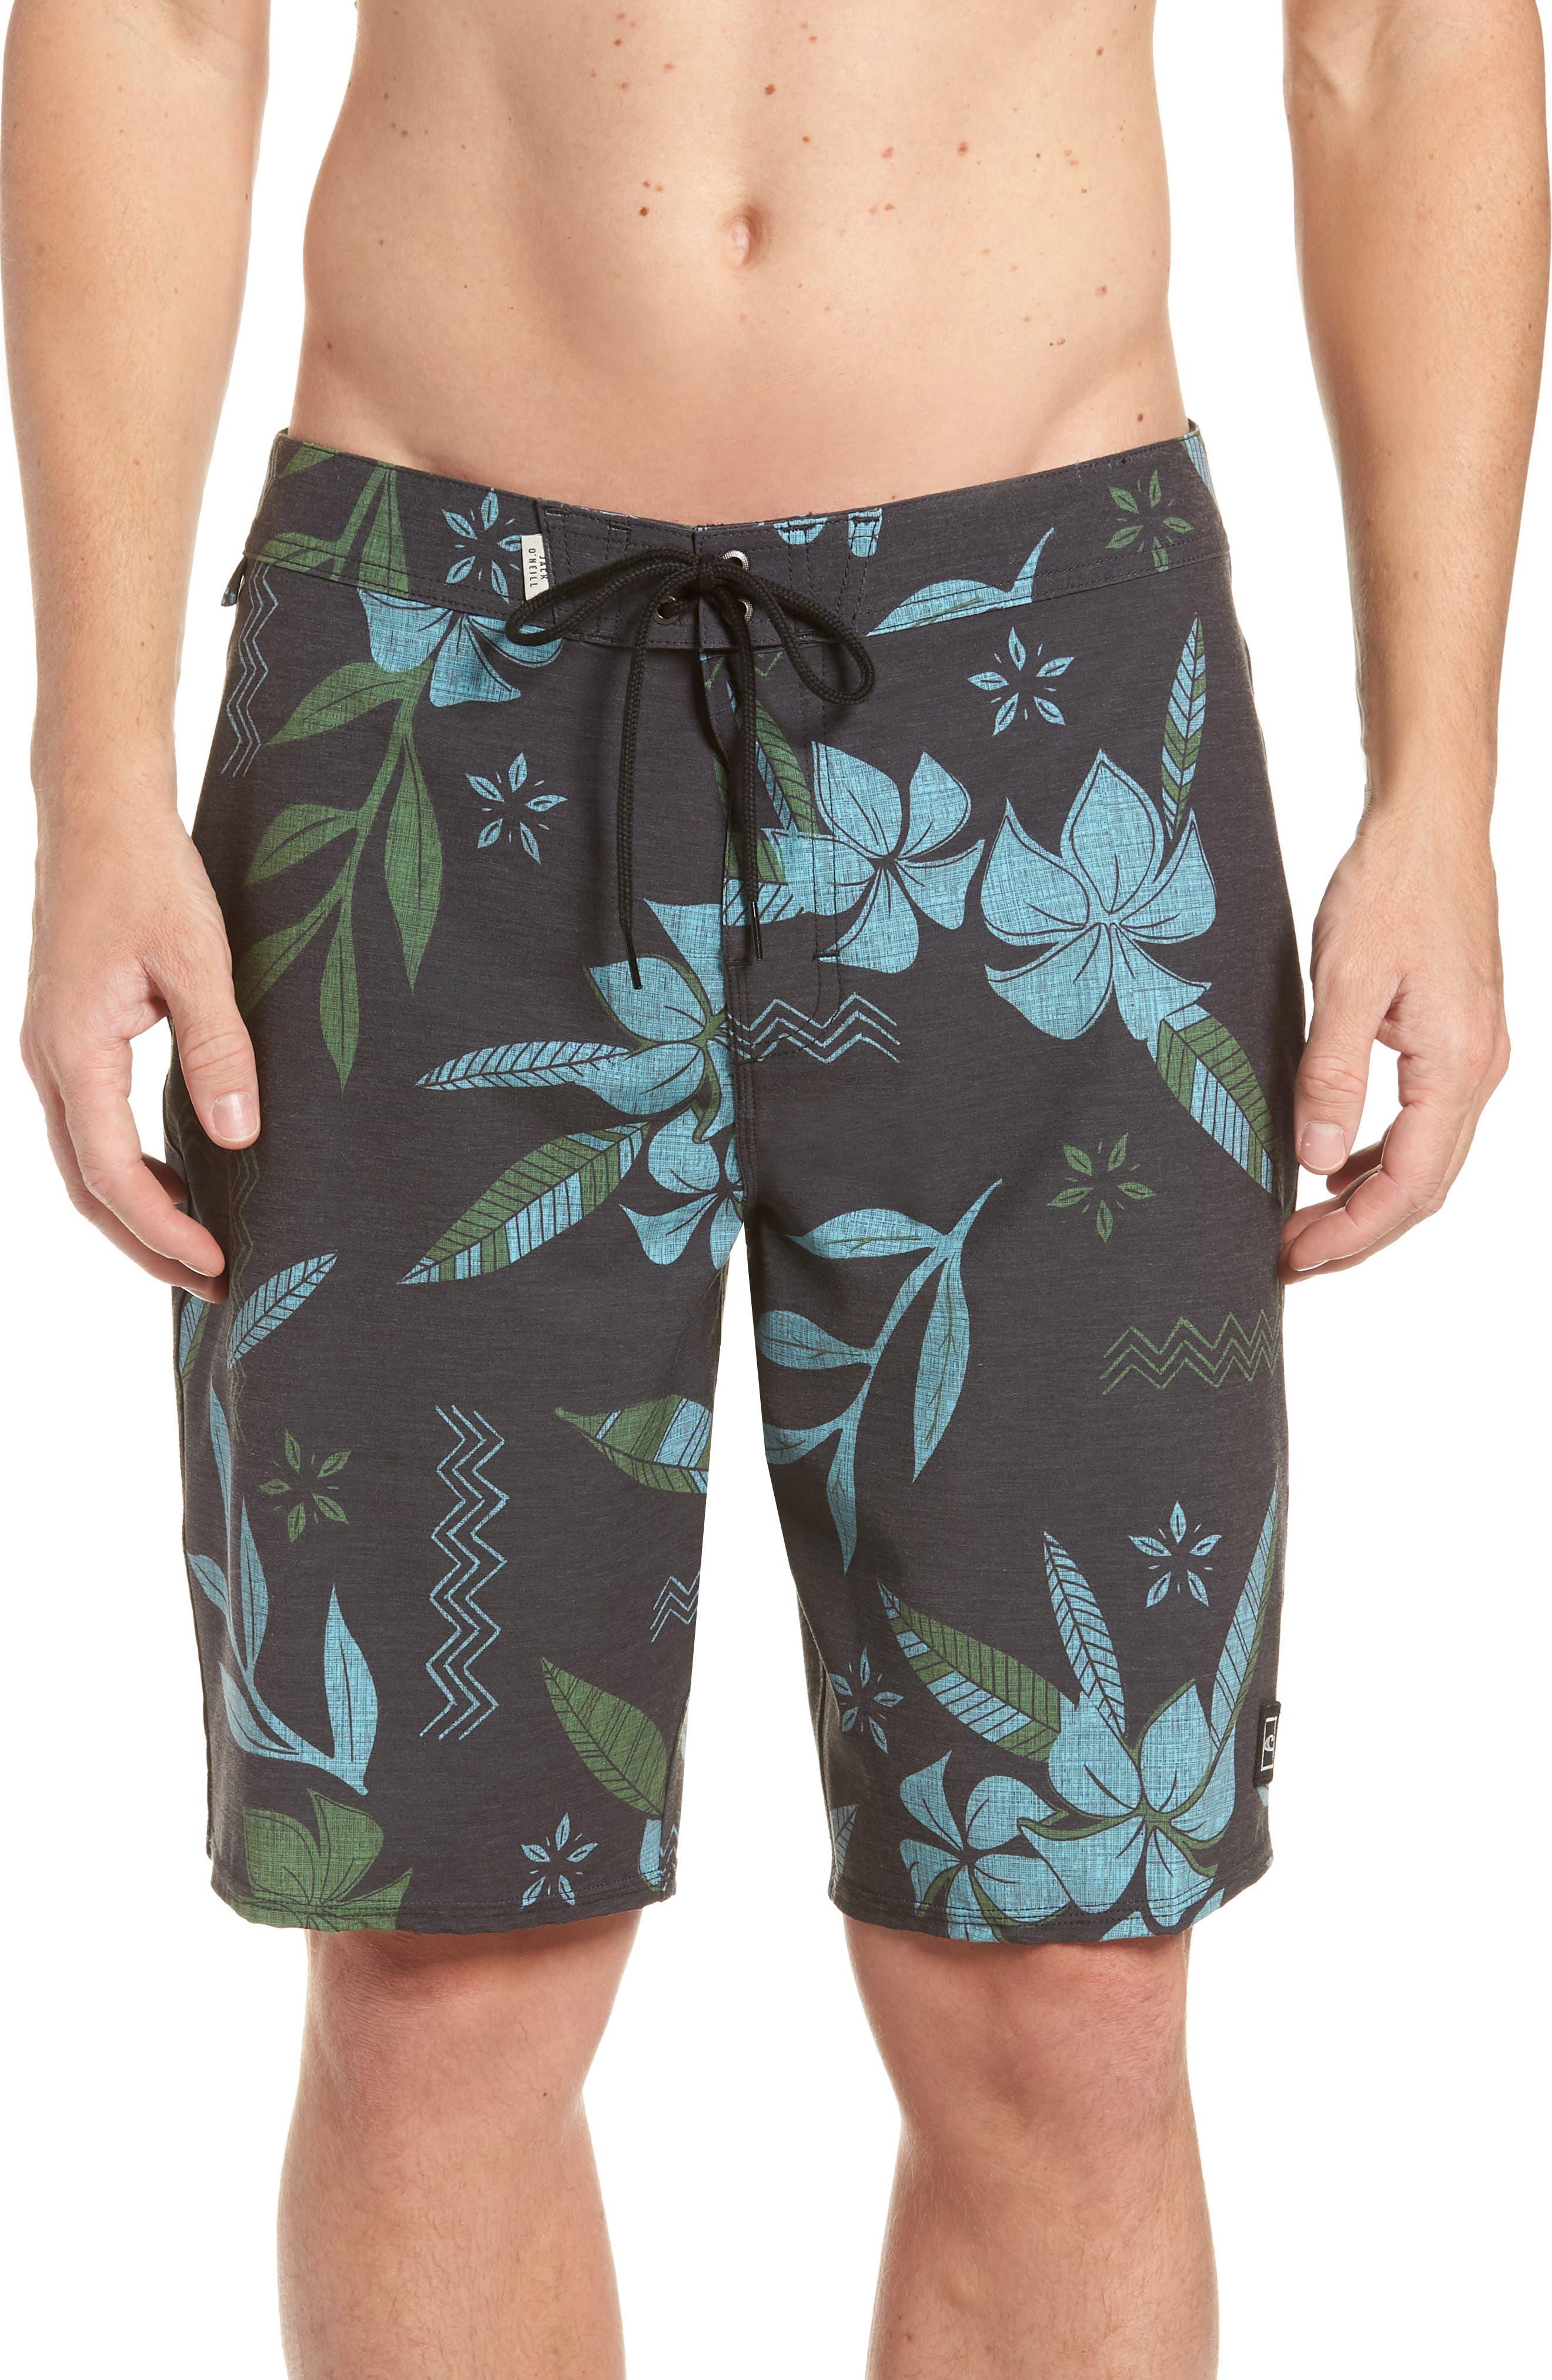 Maui Board Shorts,                         Main,                         color, Black